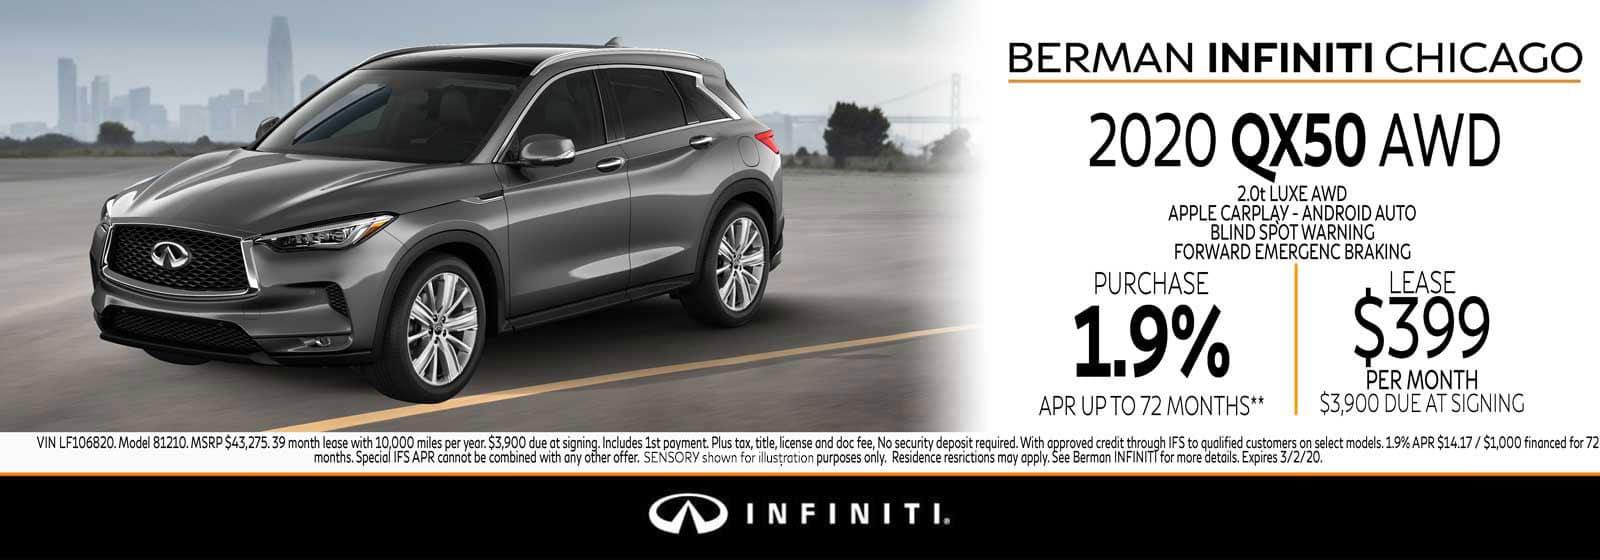 New 2020 INFINITI QX50 February offer at Berman INFINITI Chicago!